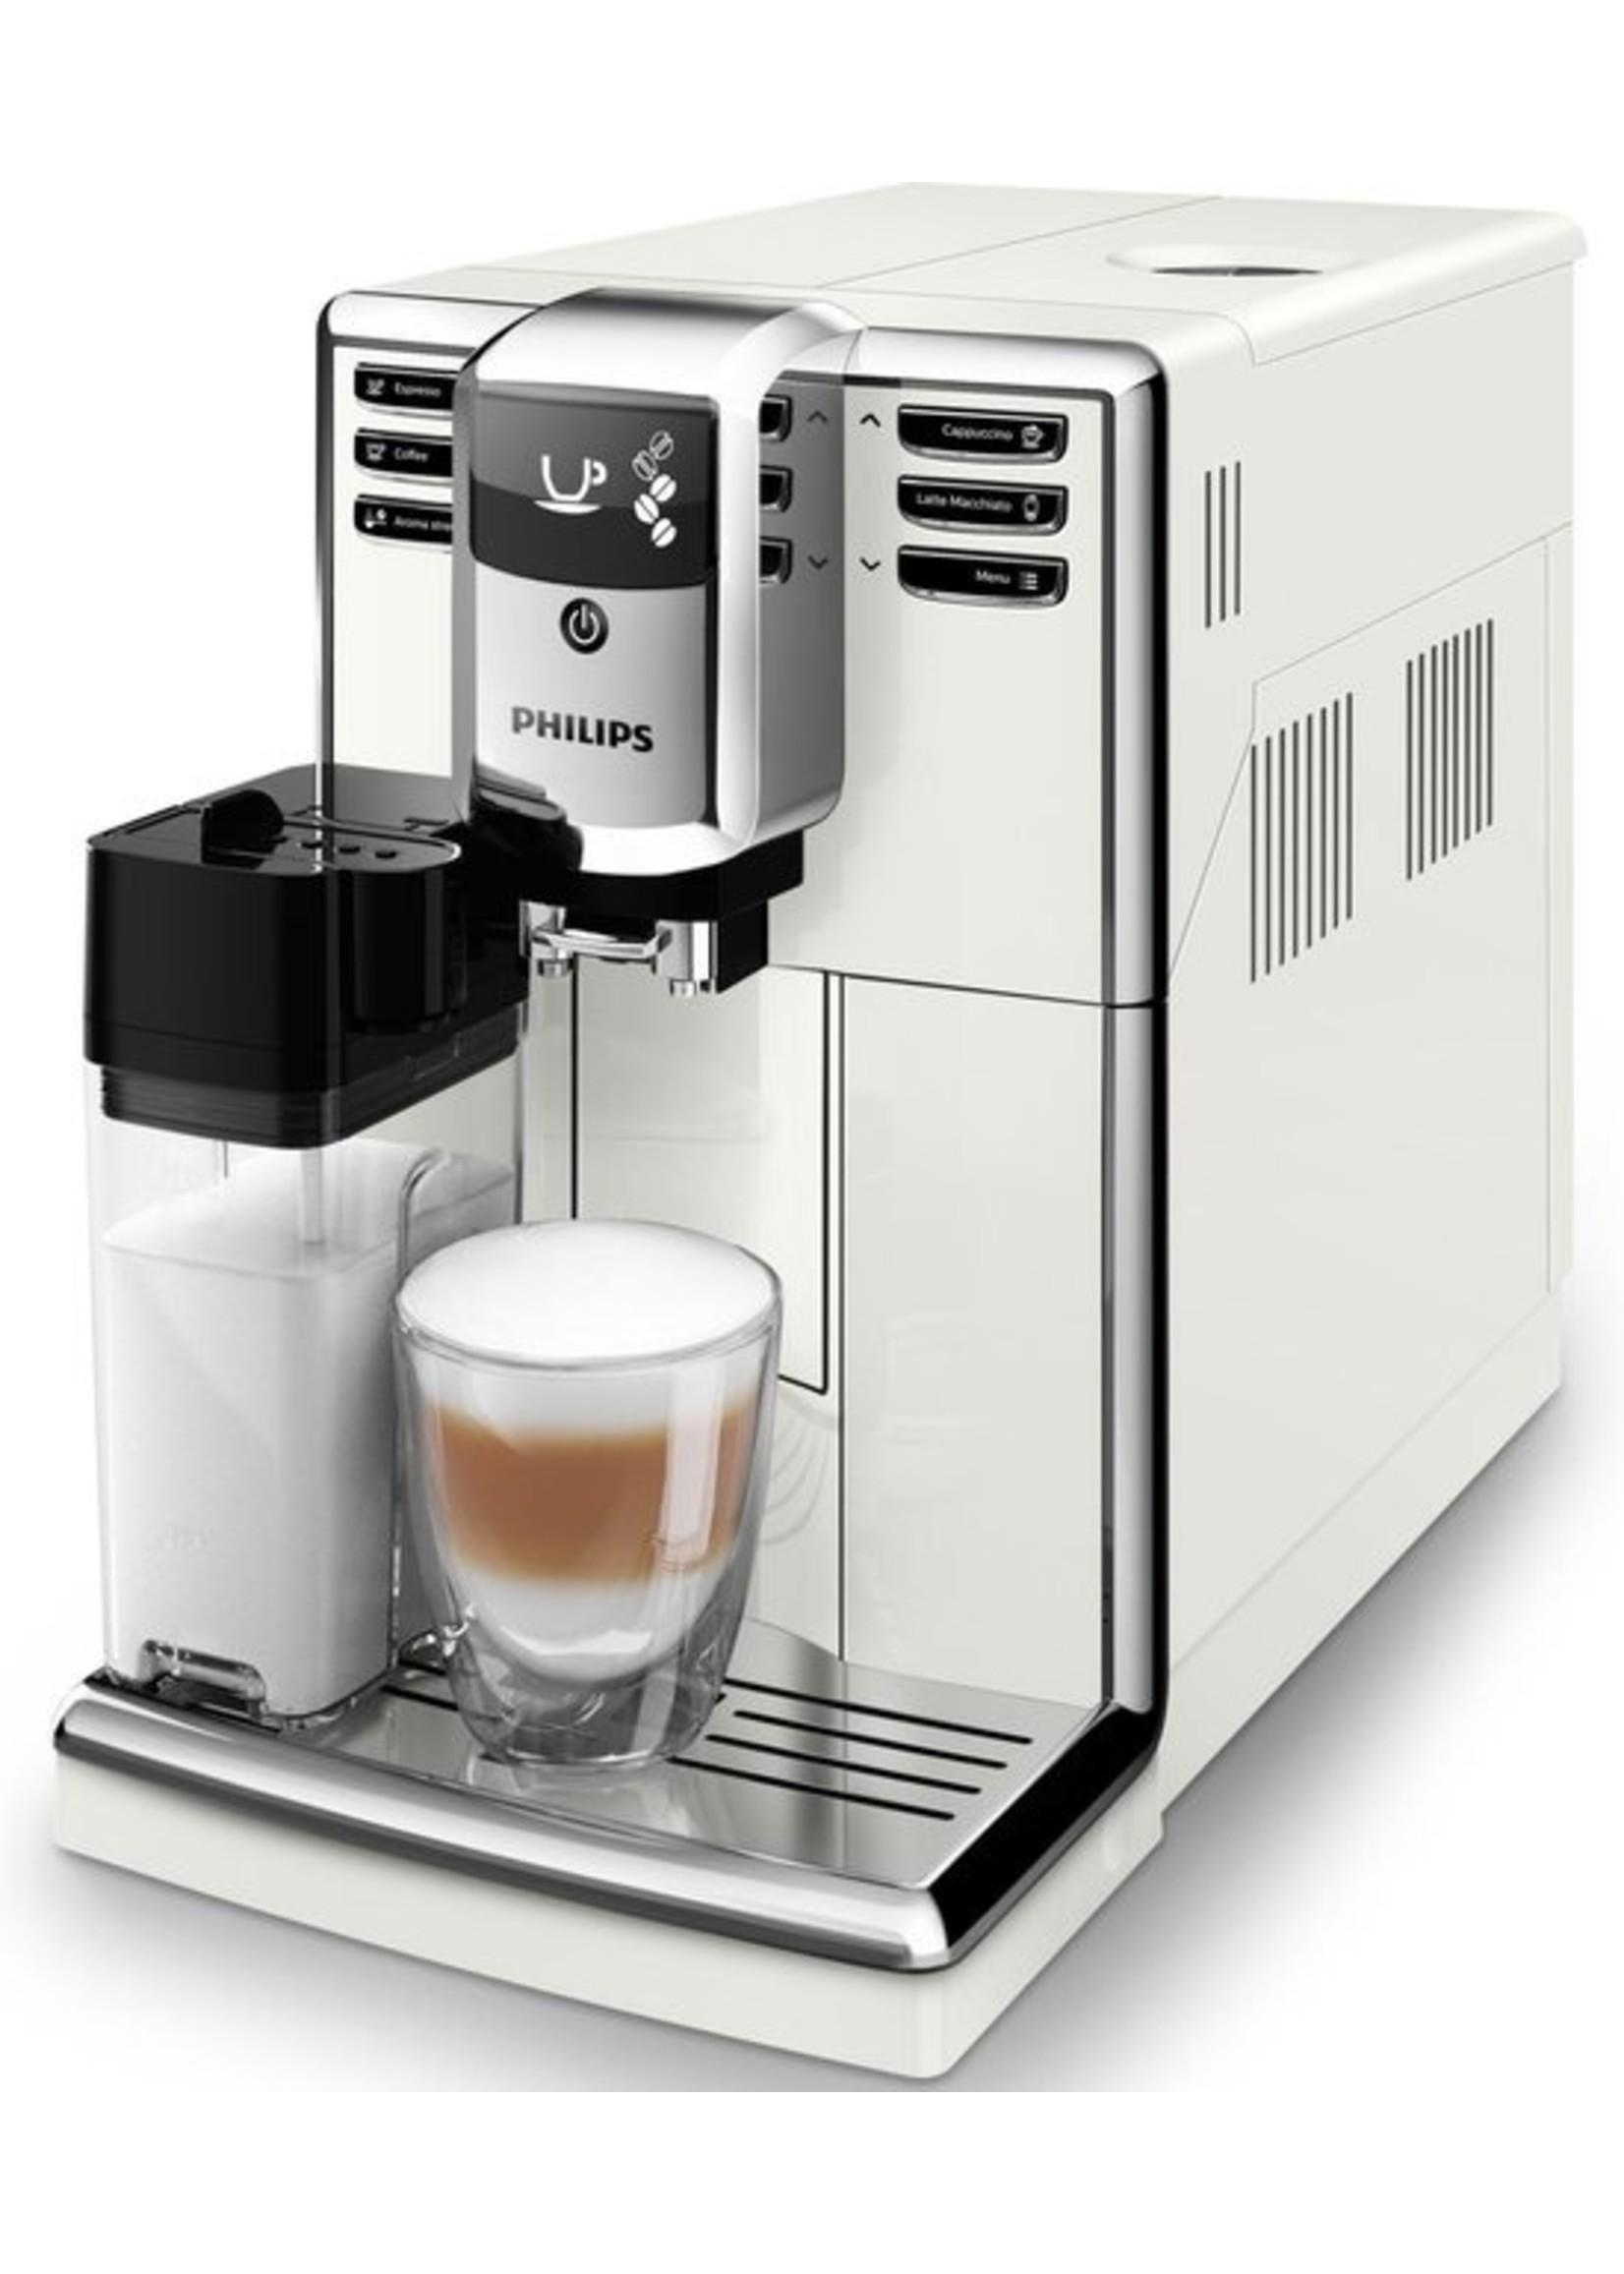 Philips Philips 5000 serie EP5361/10 - Espressomachine - Wit koopjeshoek (B)